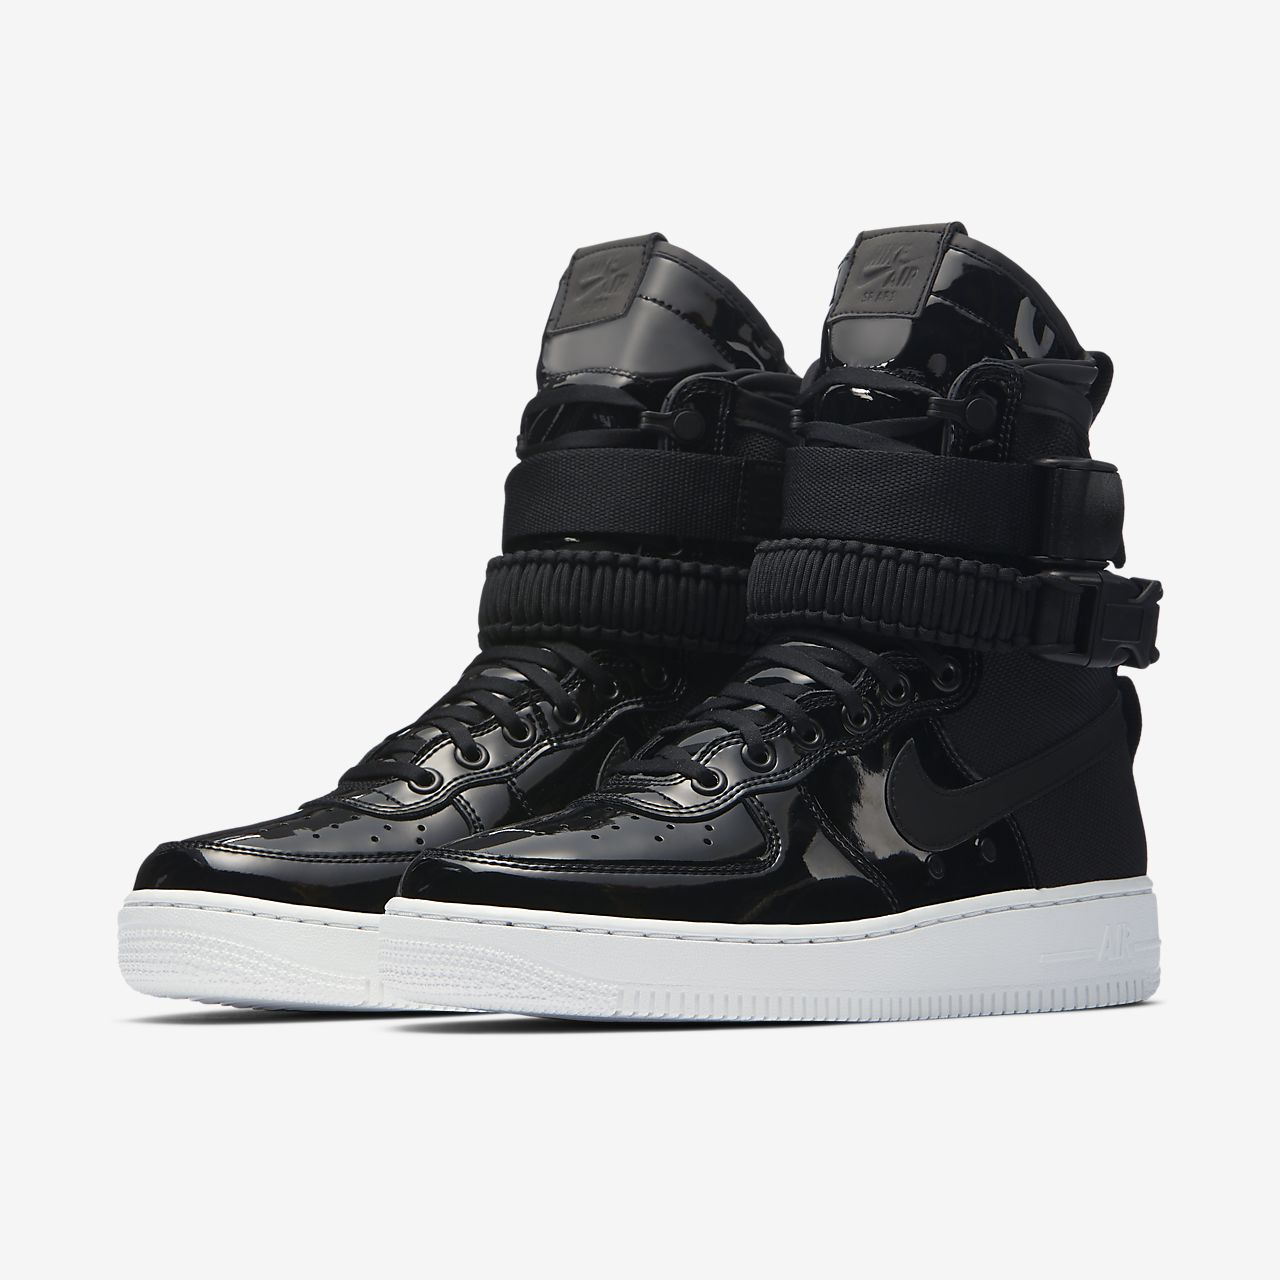 Air Force 1 Calzado negro Nike 3zacKBWK